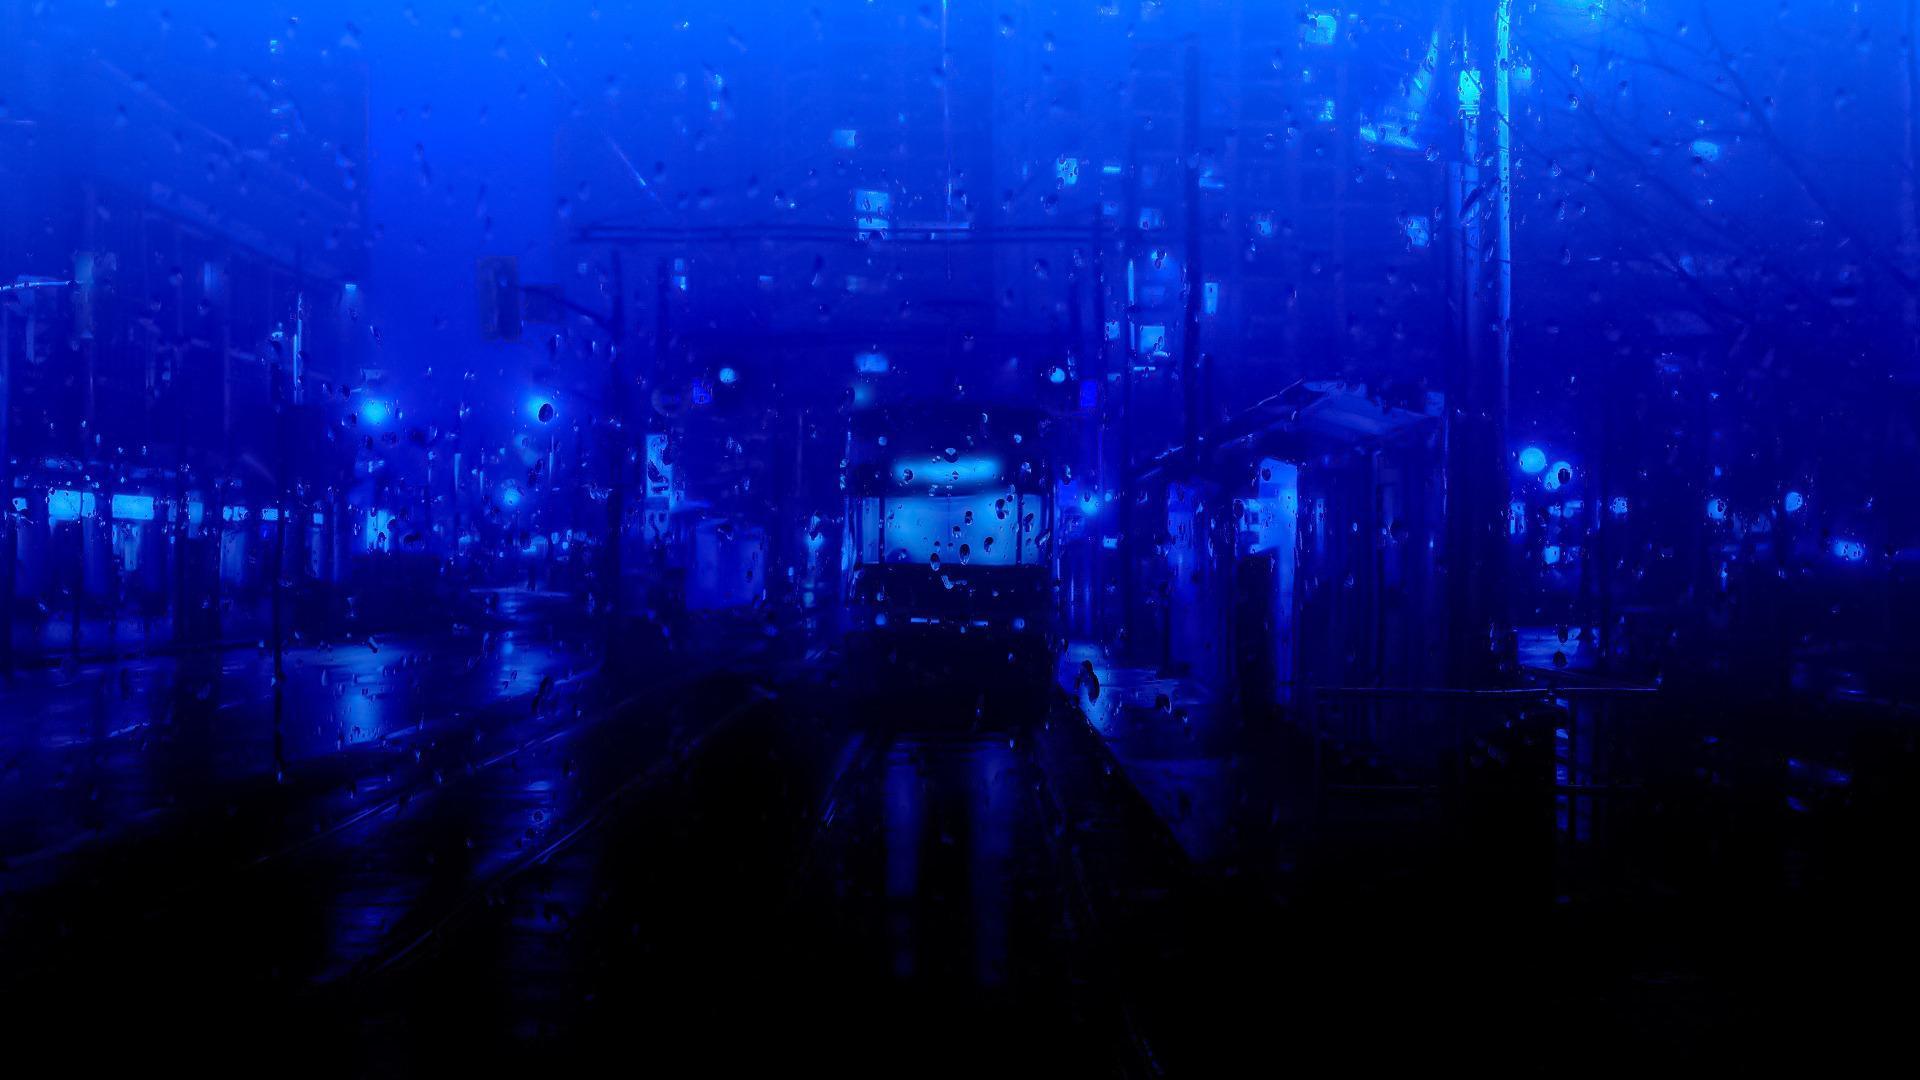 44 Best Free Blue Rain Wallpapers Wallpaperaccess